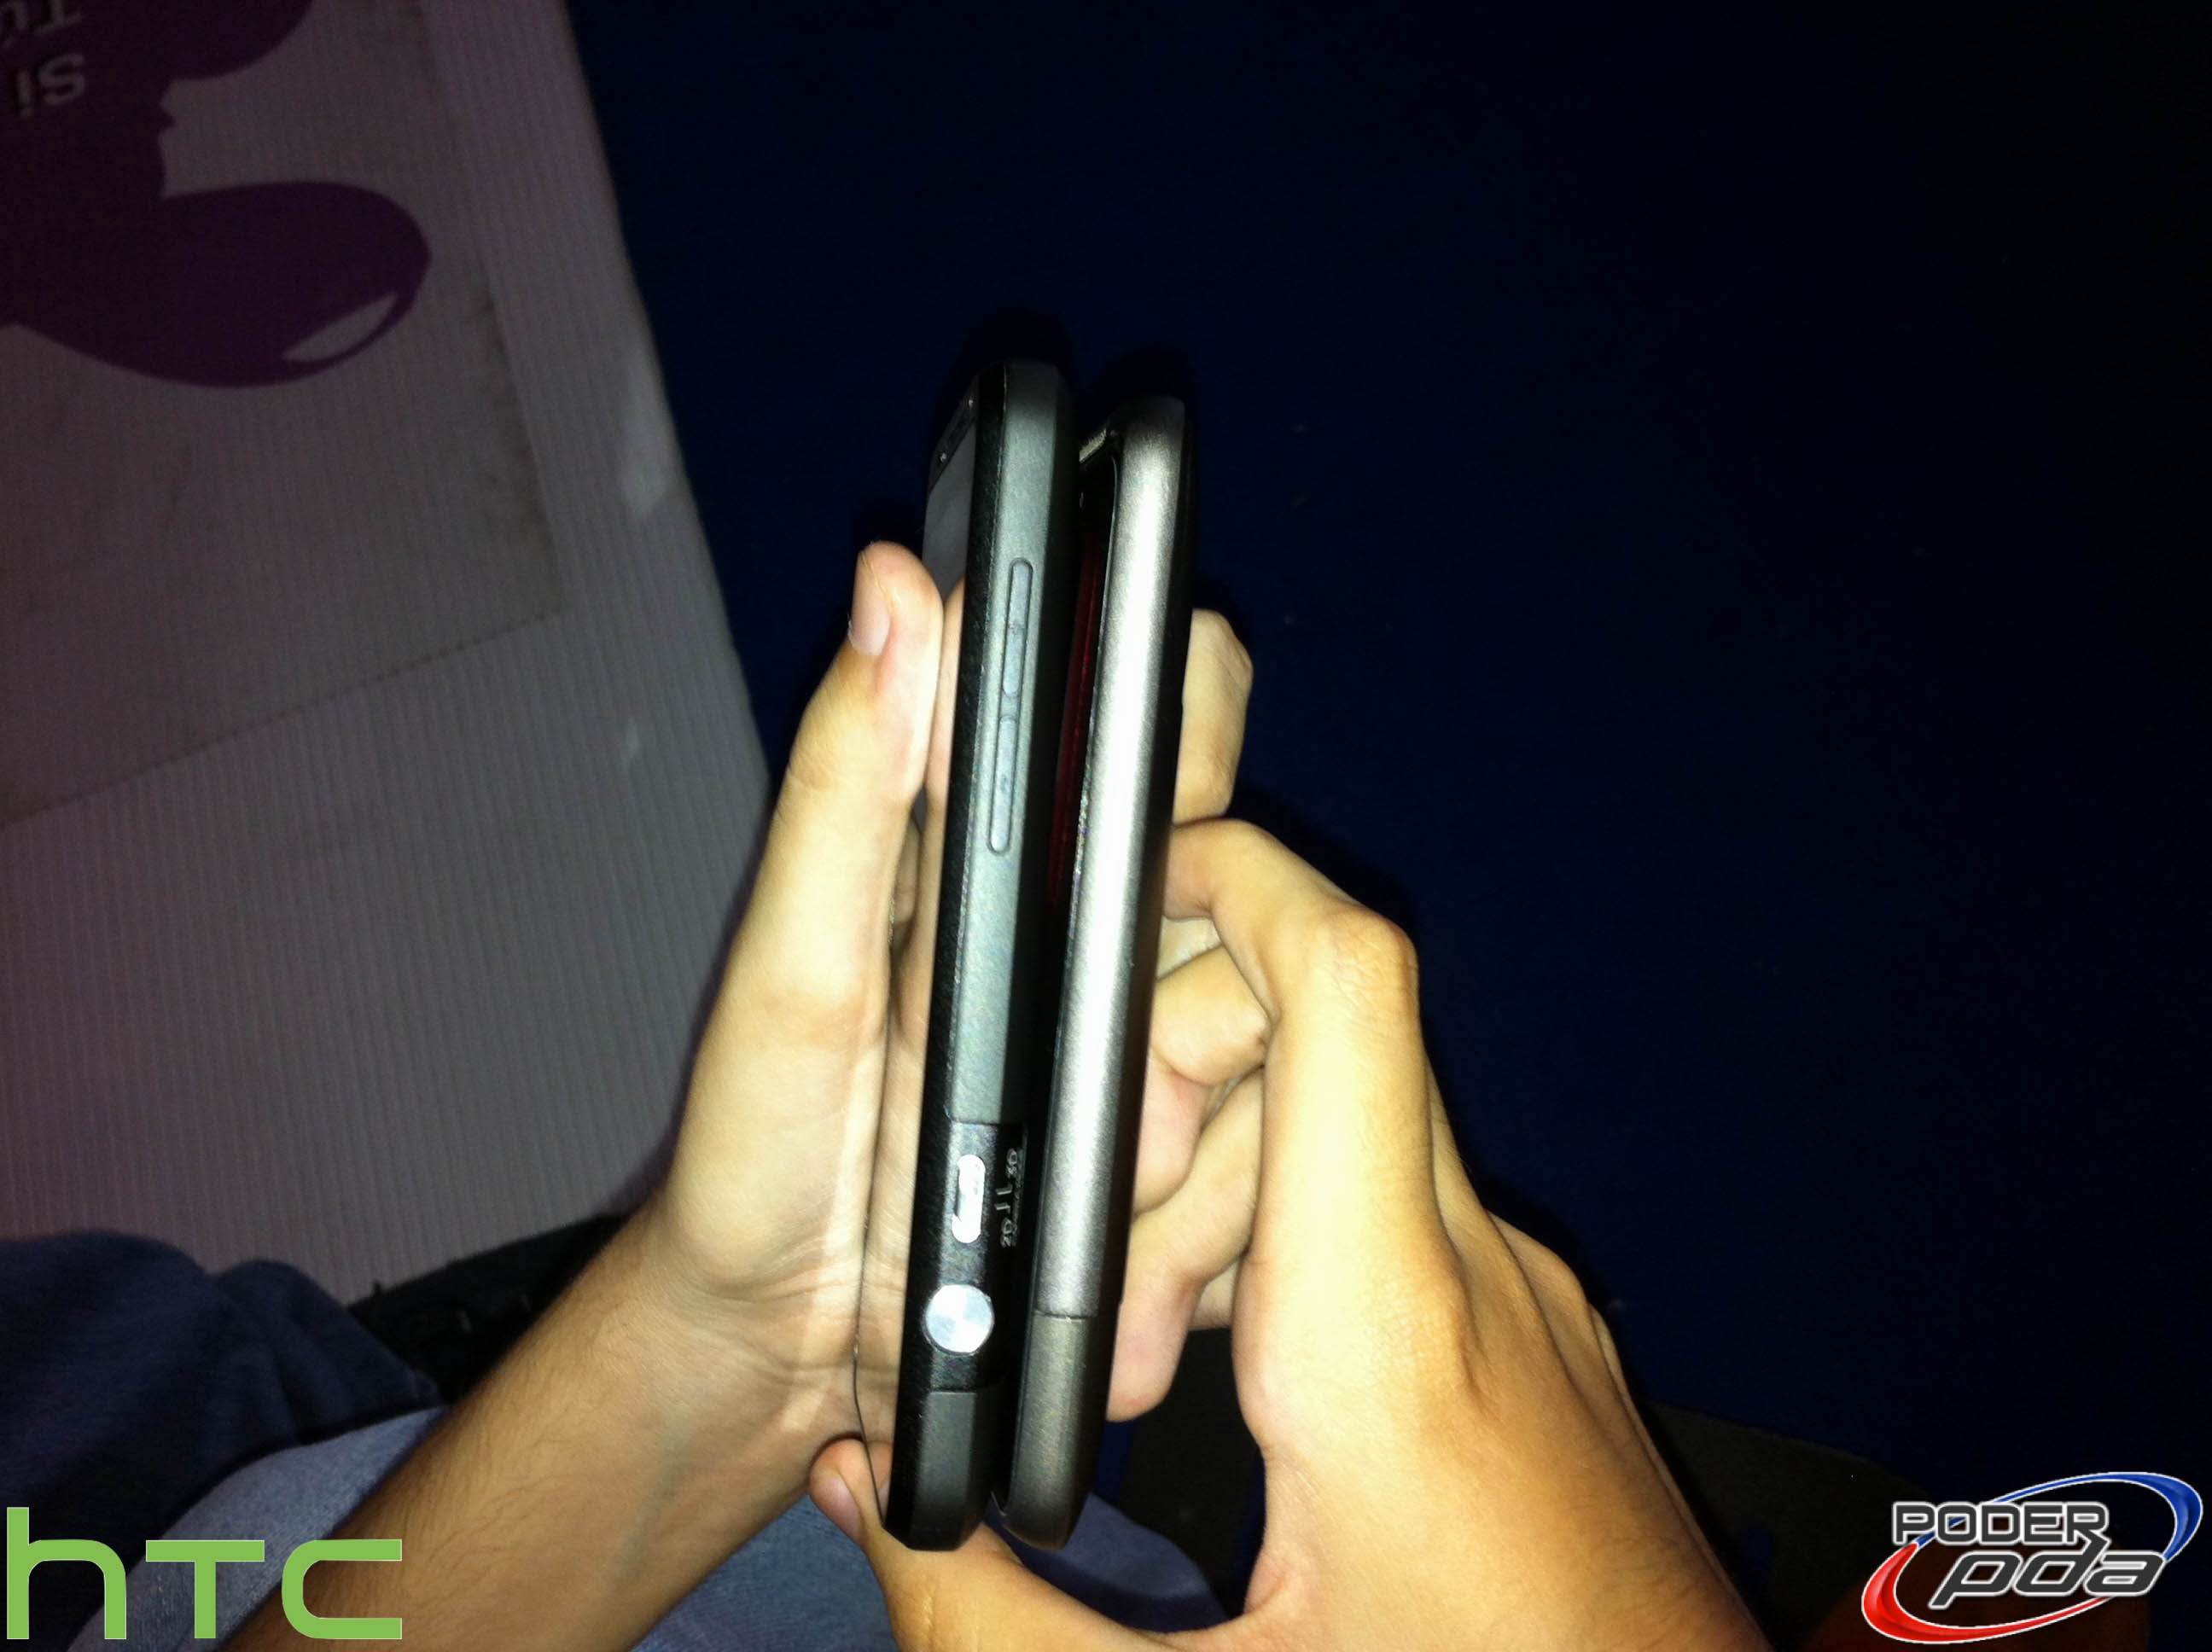 HTC-Inspire-3D-en-Mexico-ADMX3-11